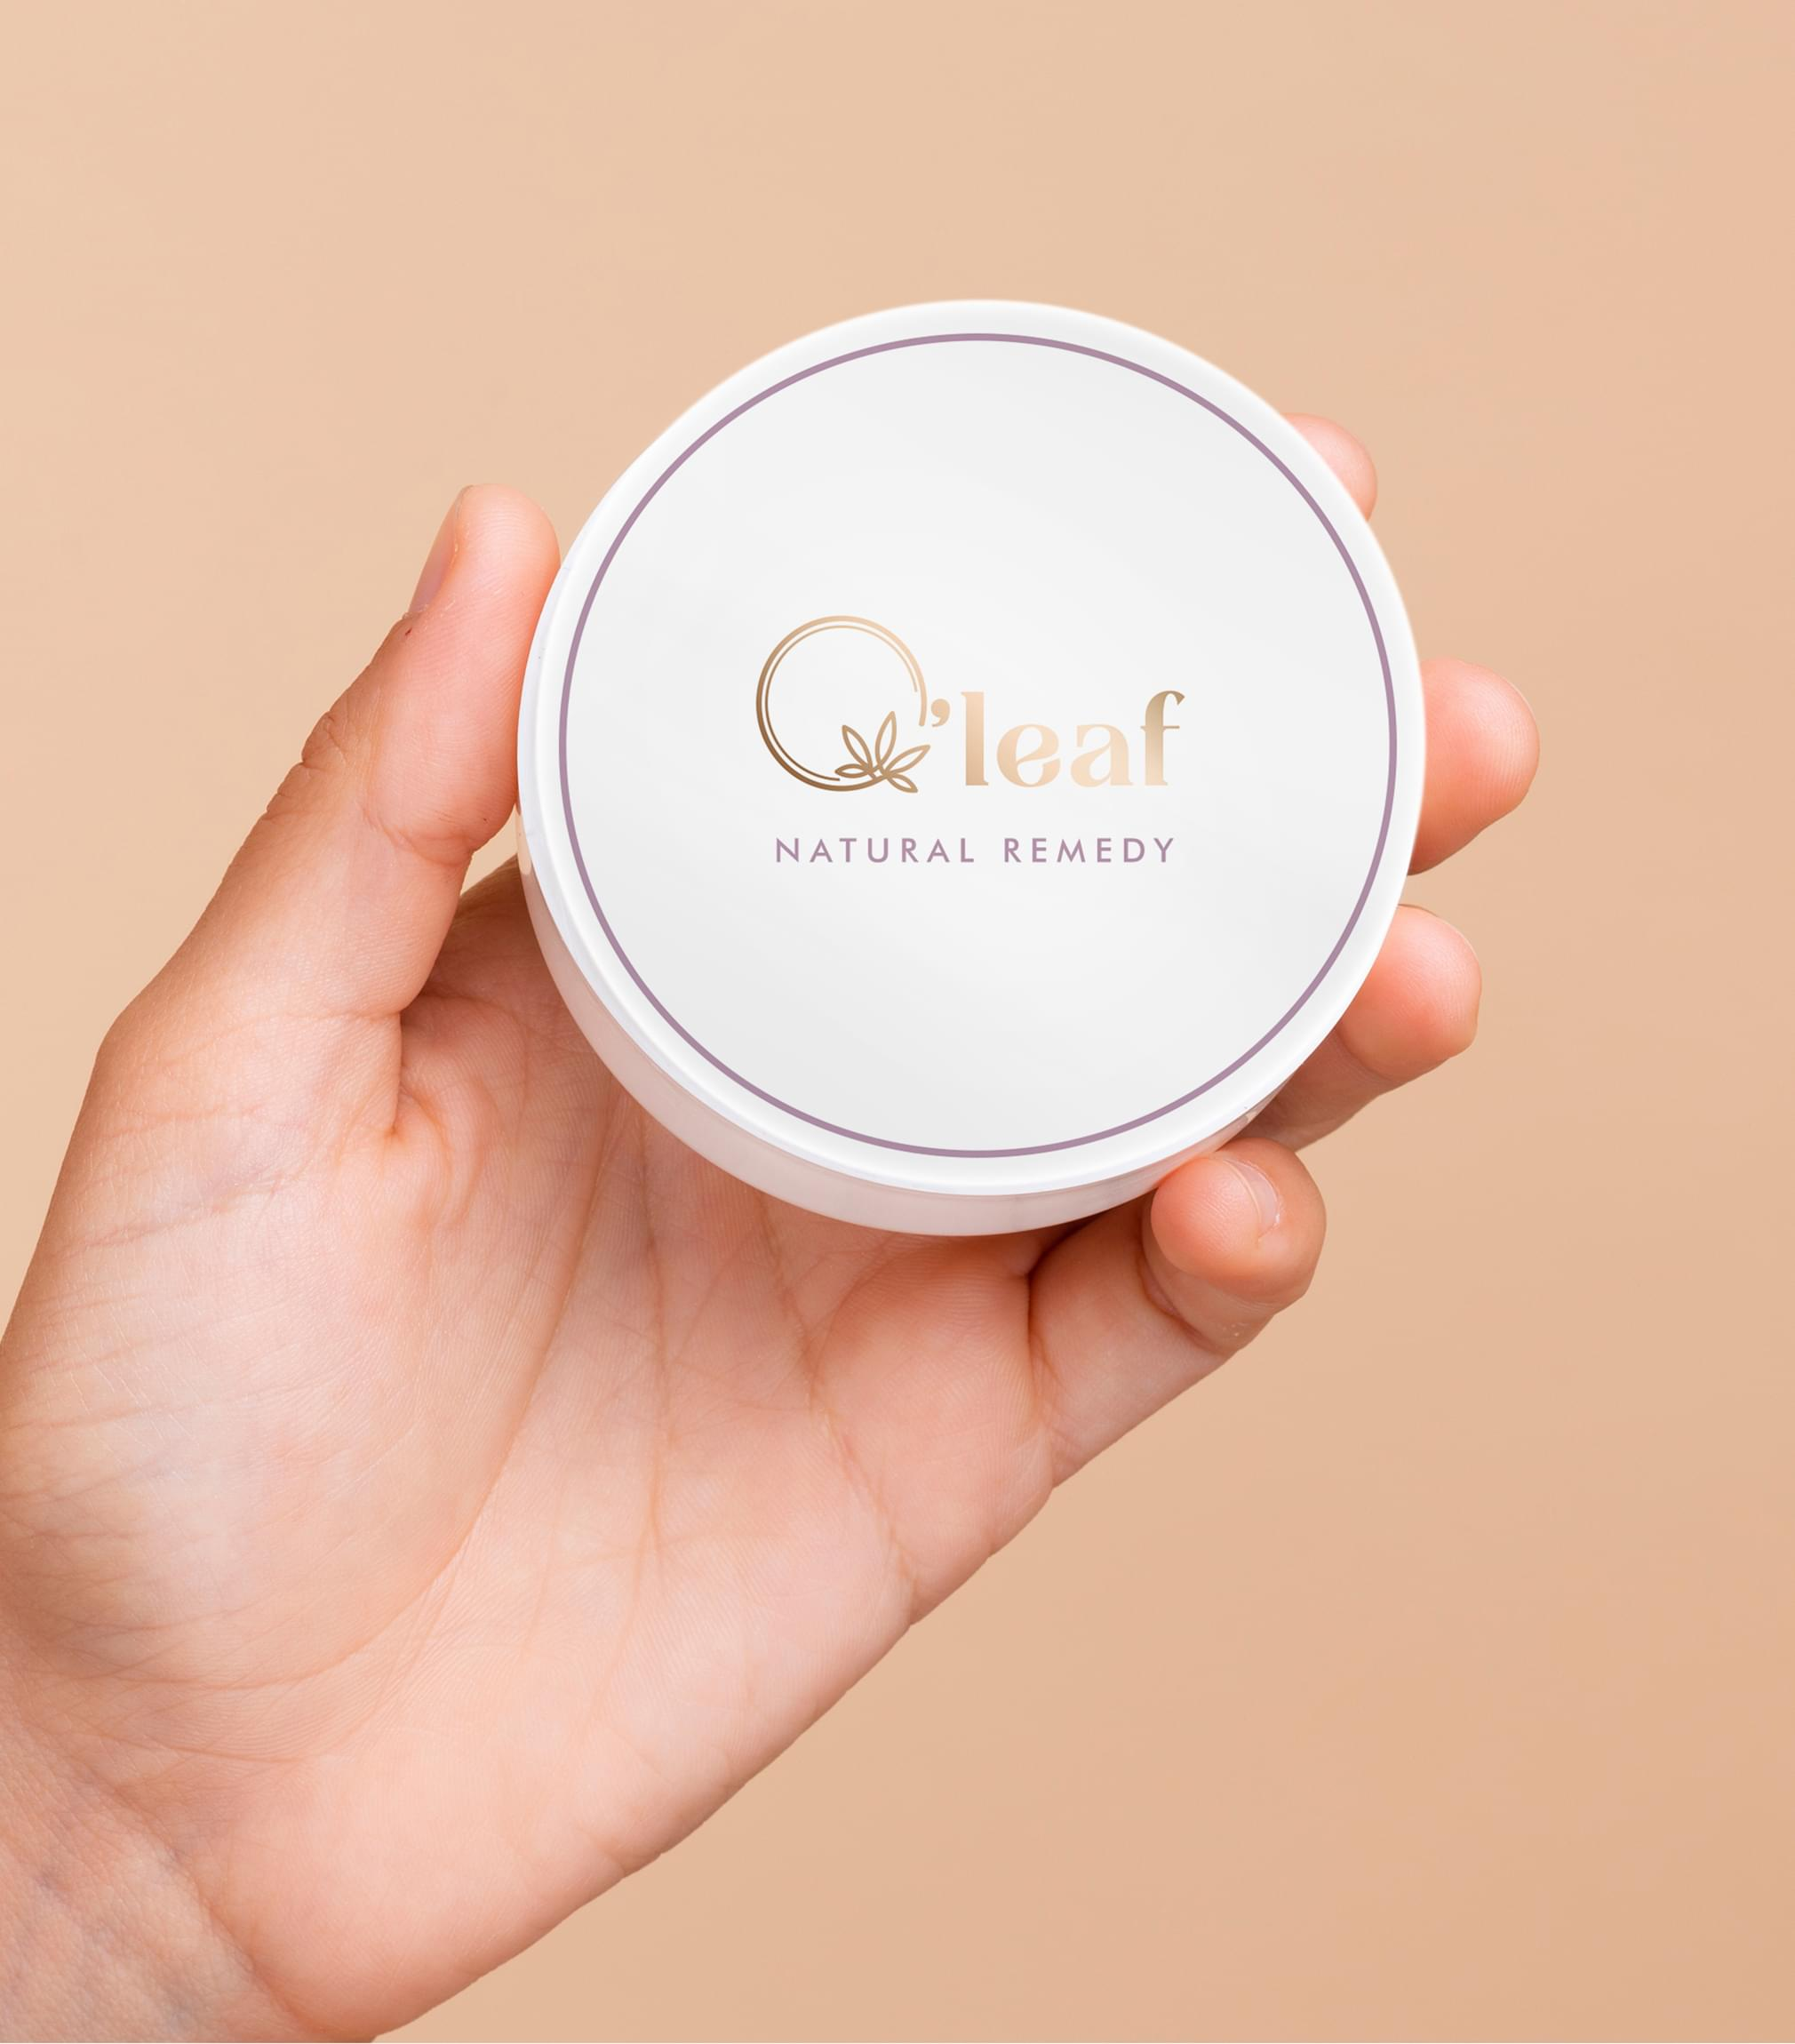 O'LEAF Packaging